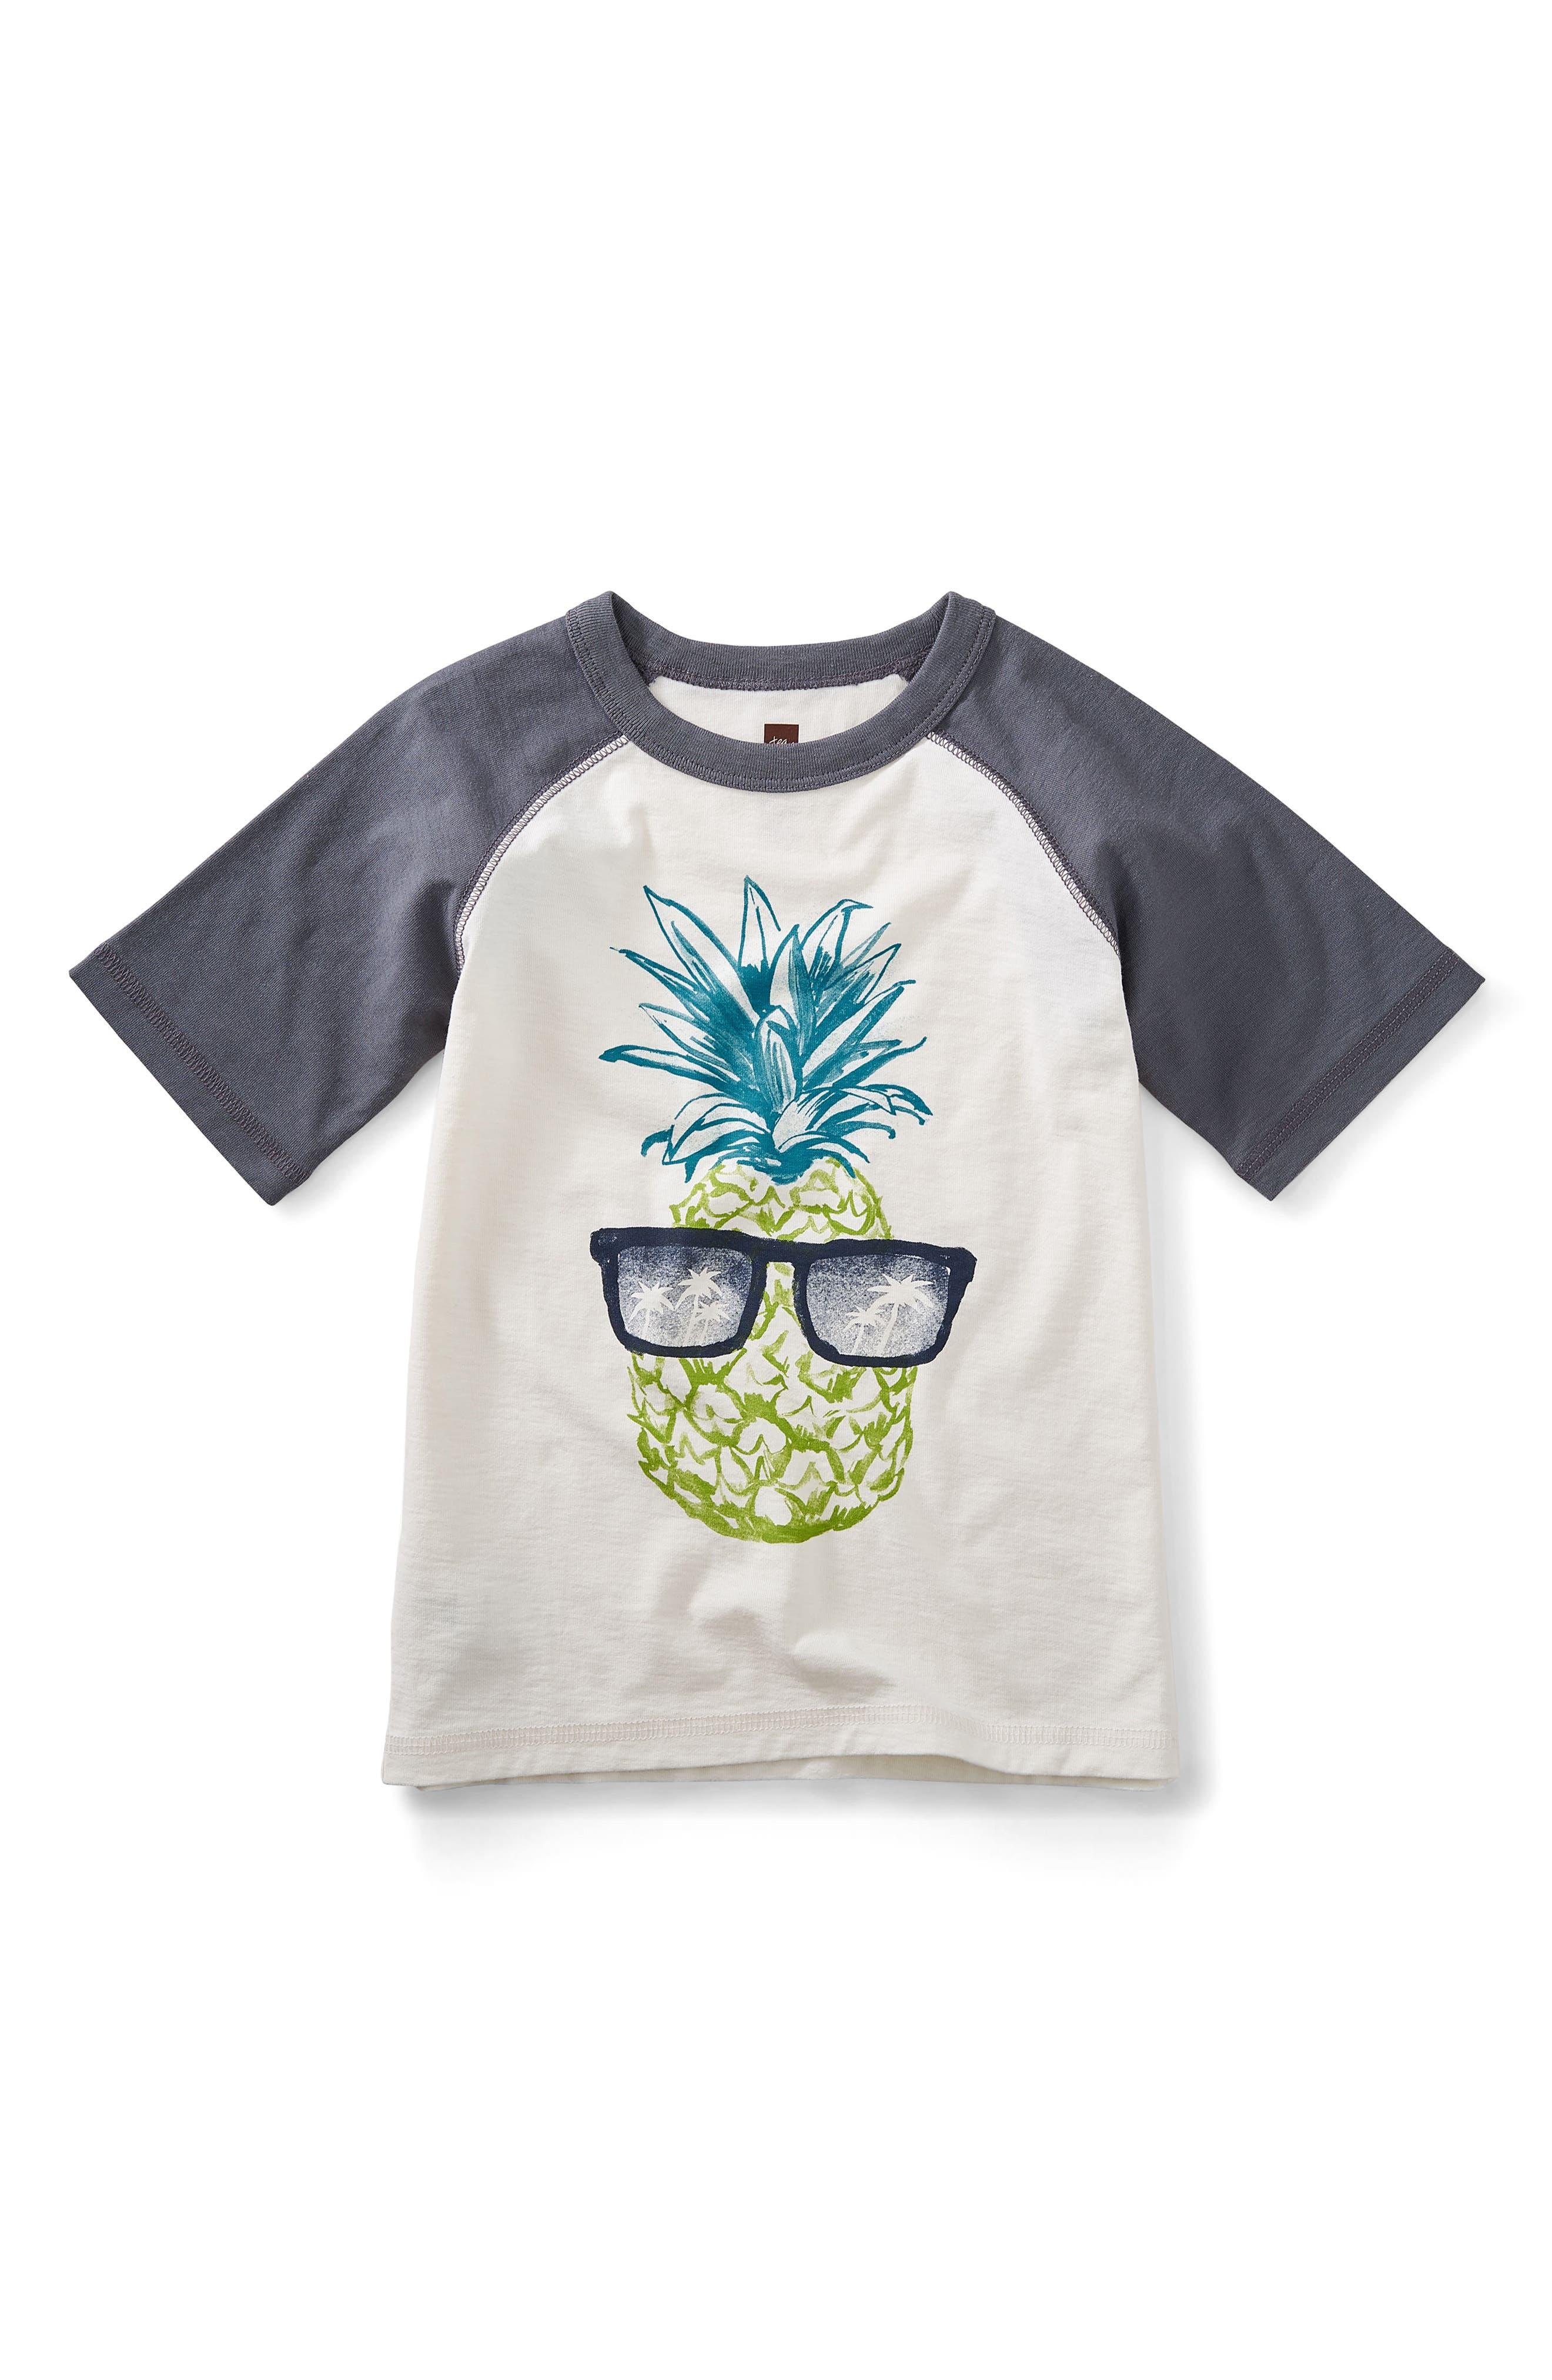 Tea Collection Sunshine Pineapple Graphic Shirt (Toddler Boys, Little Boys & Big Boys)